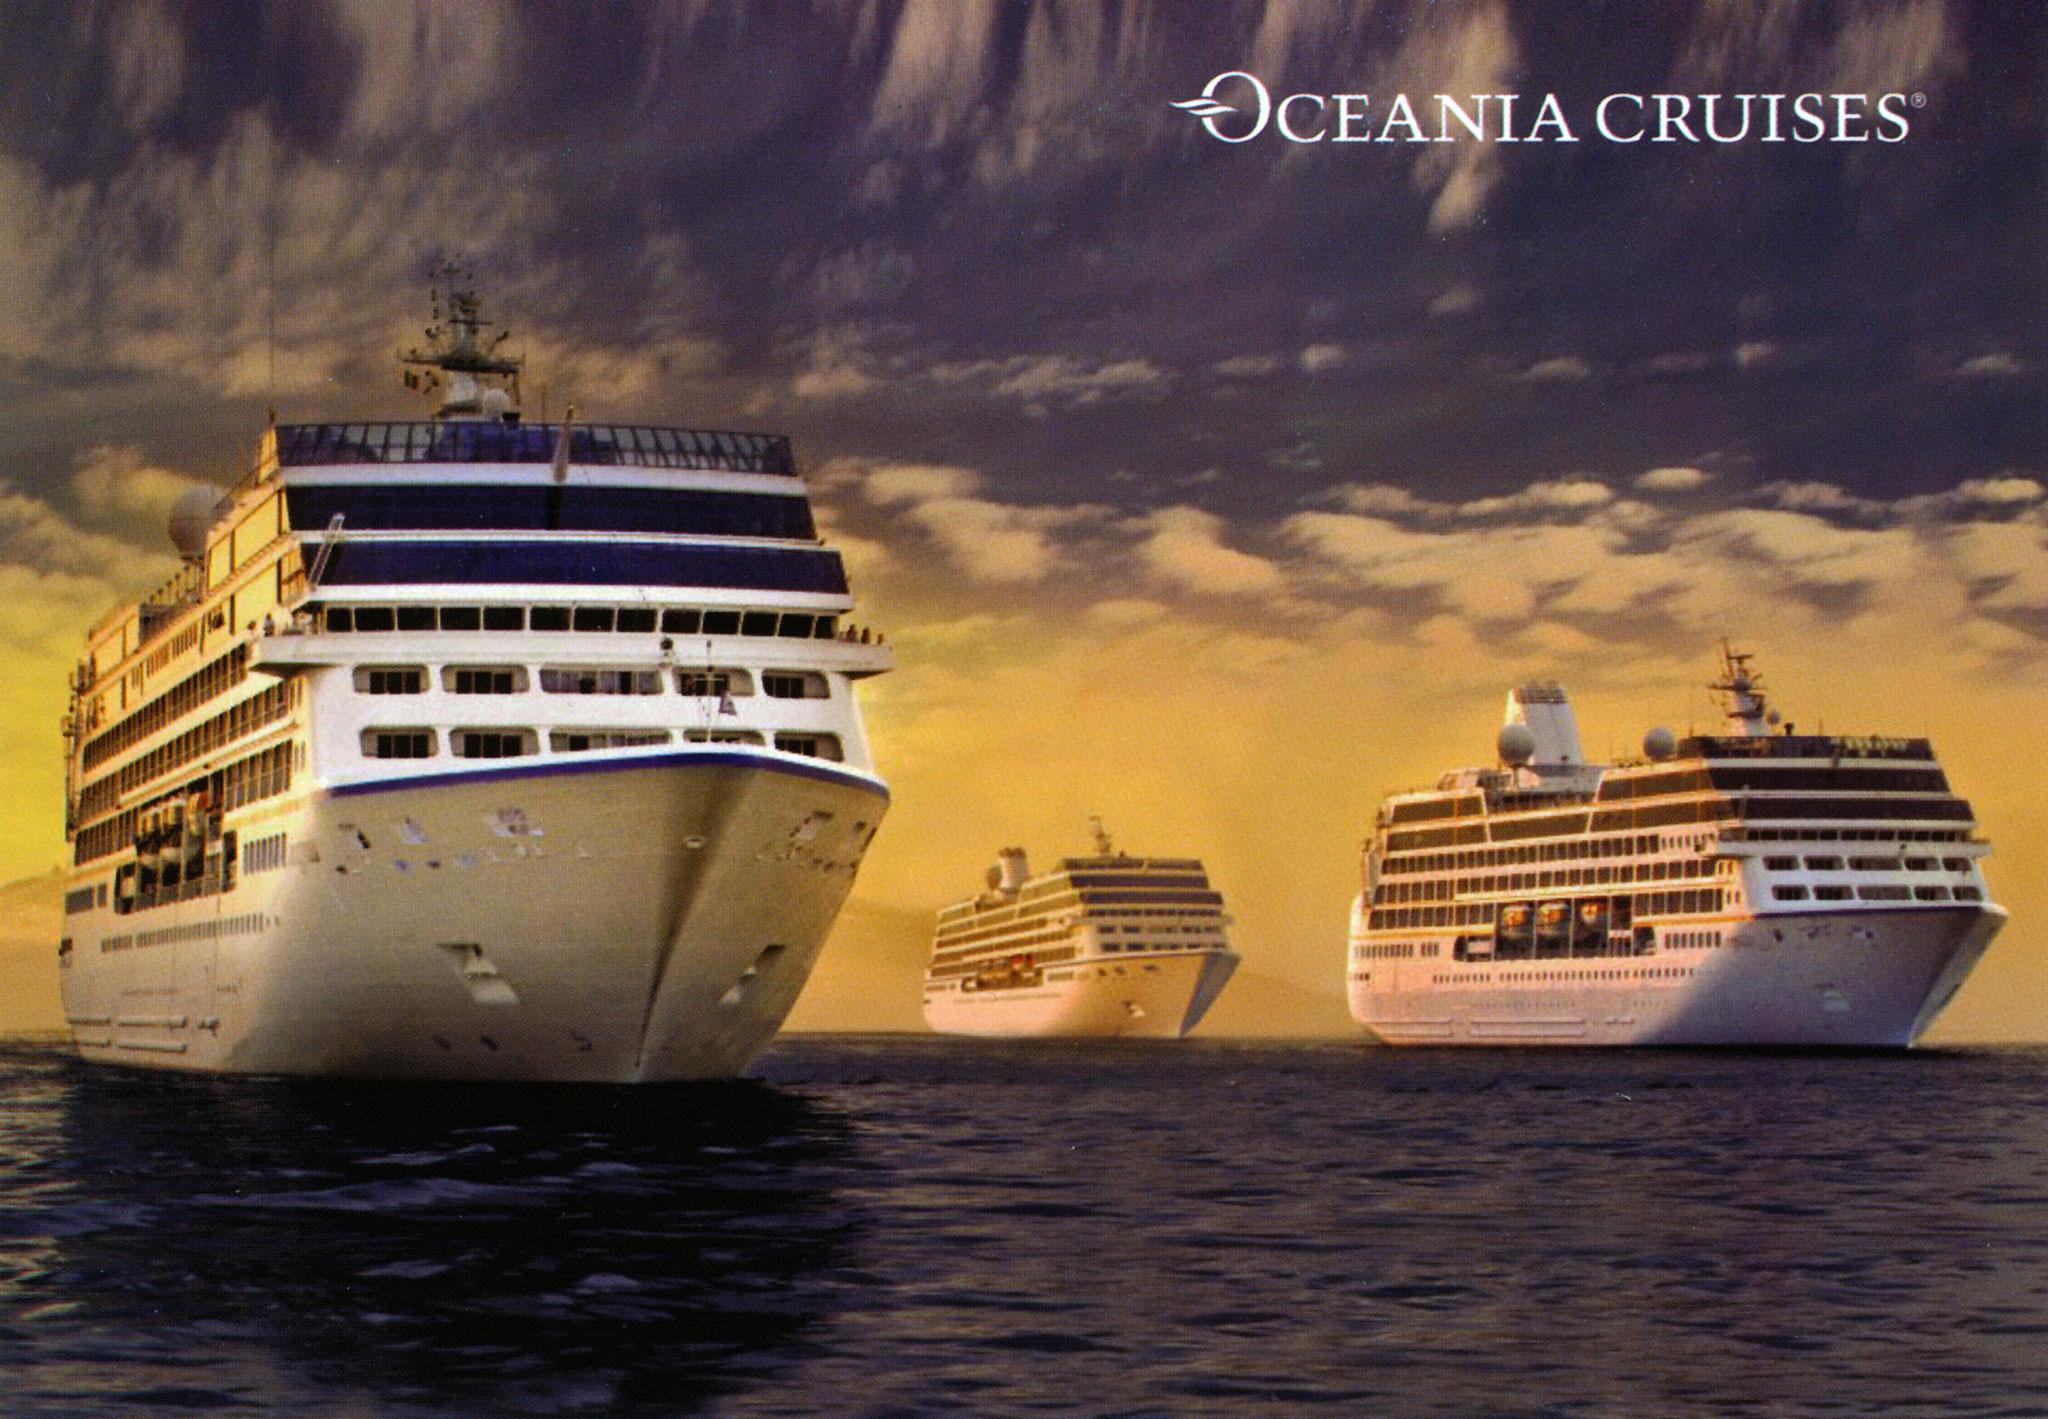 Oceania Cruises Simplon Postcards - Oceana cruise lines